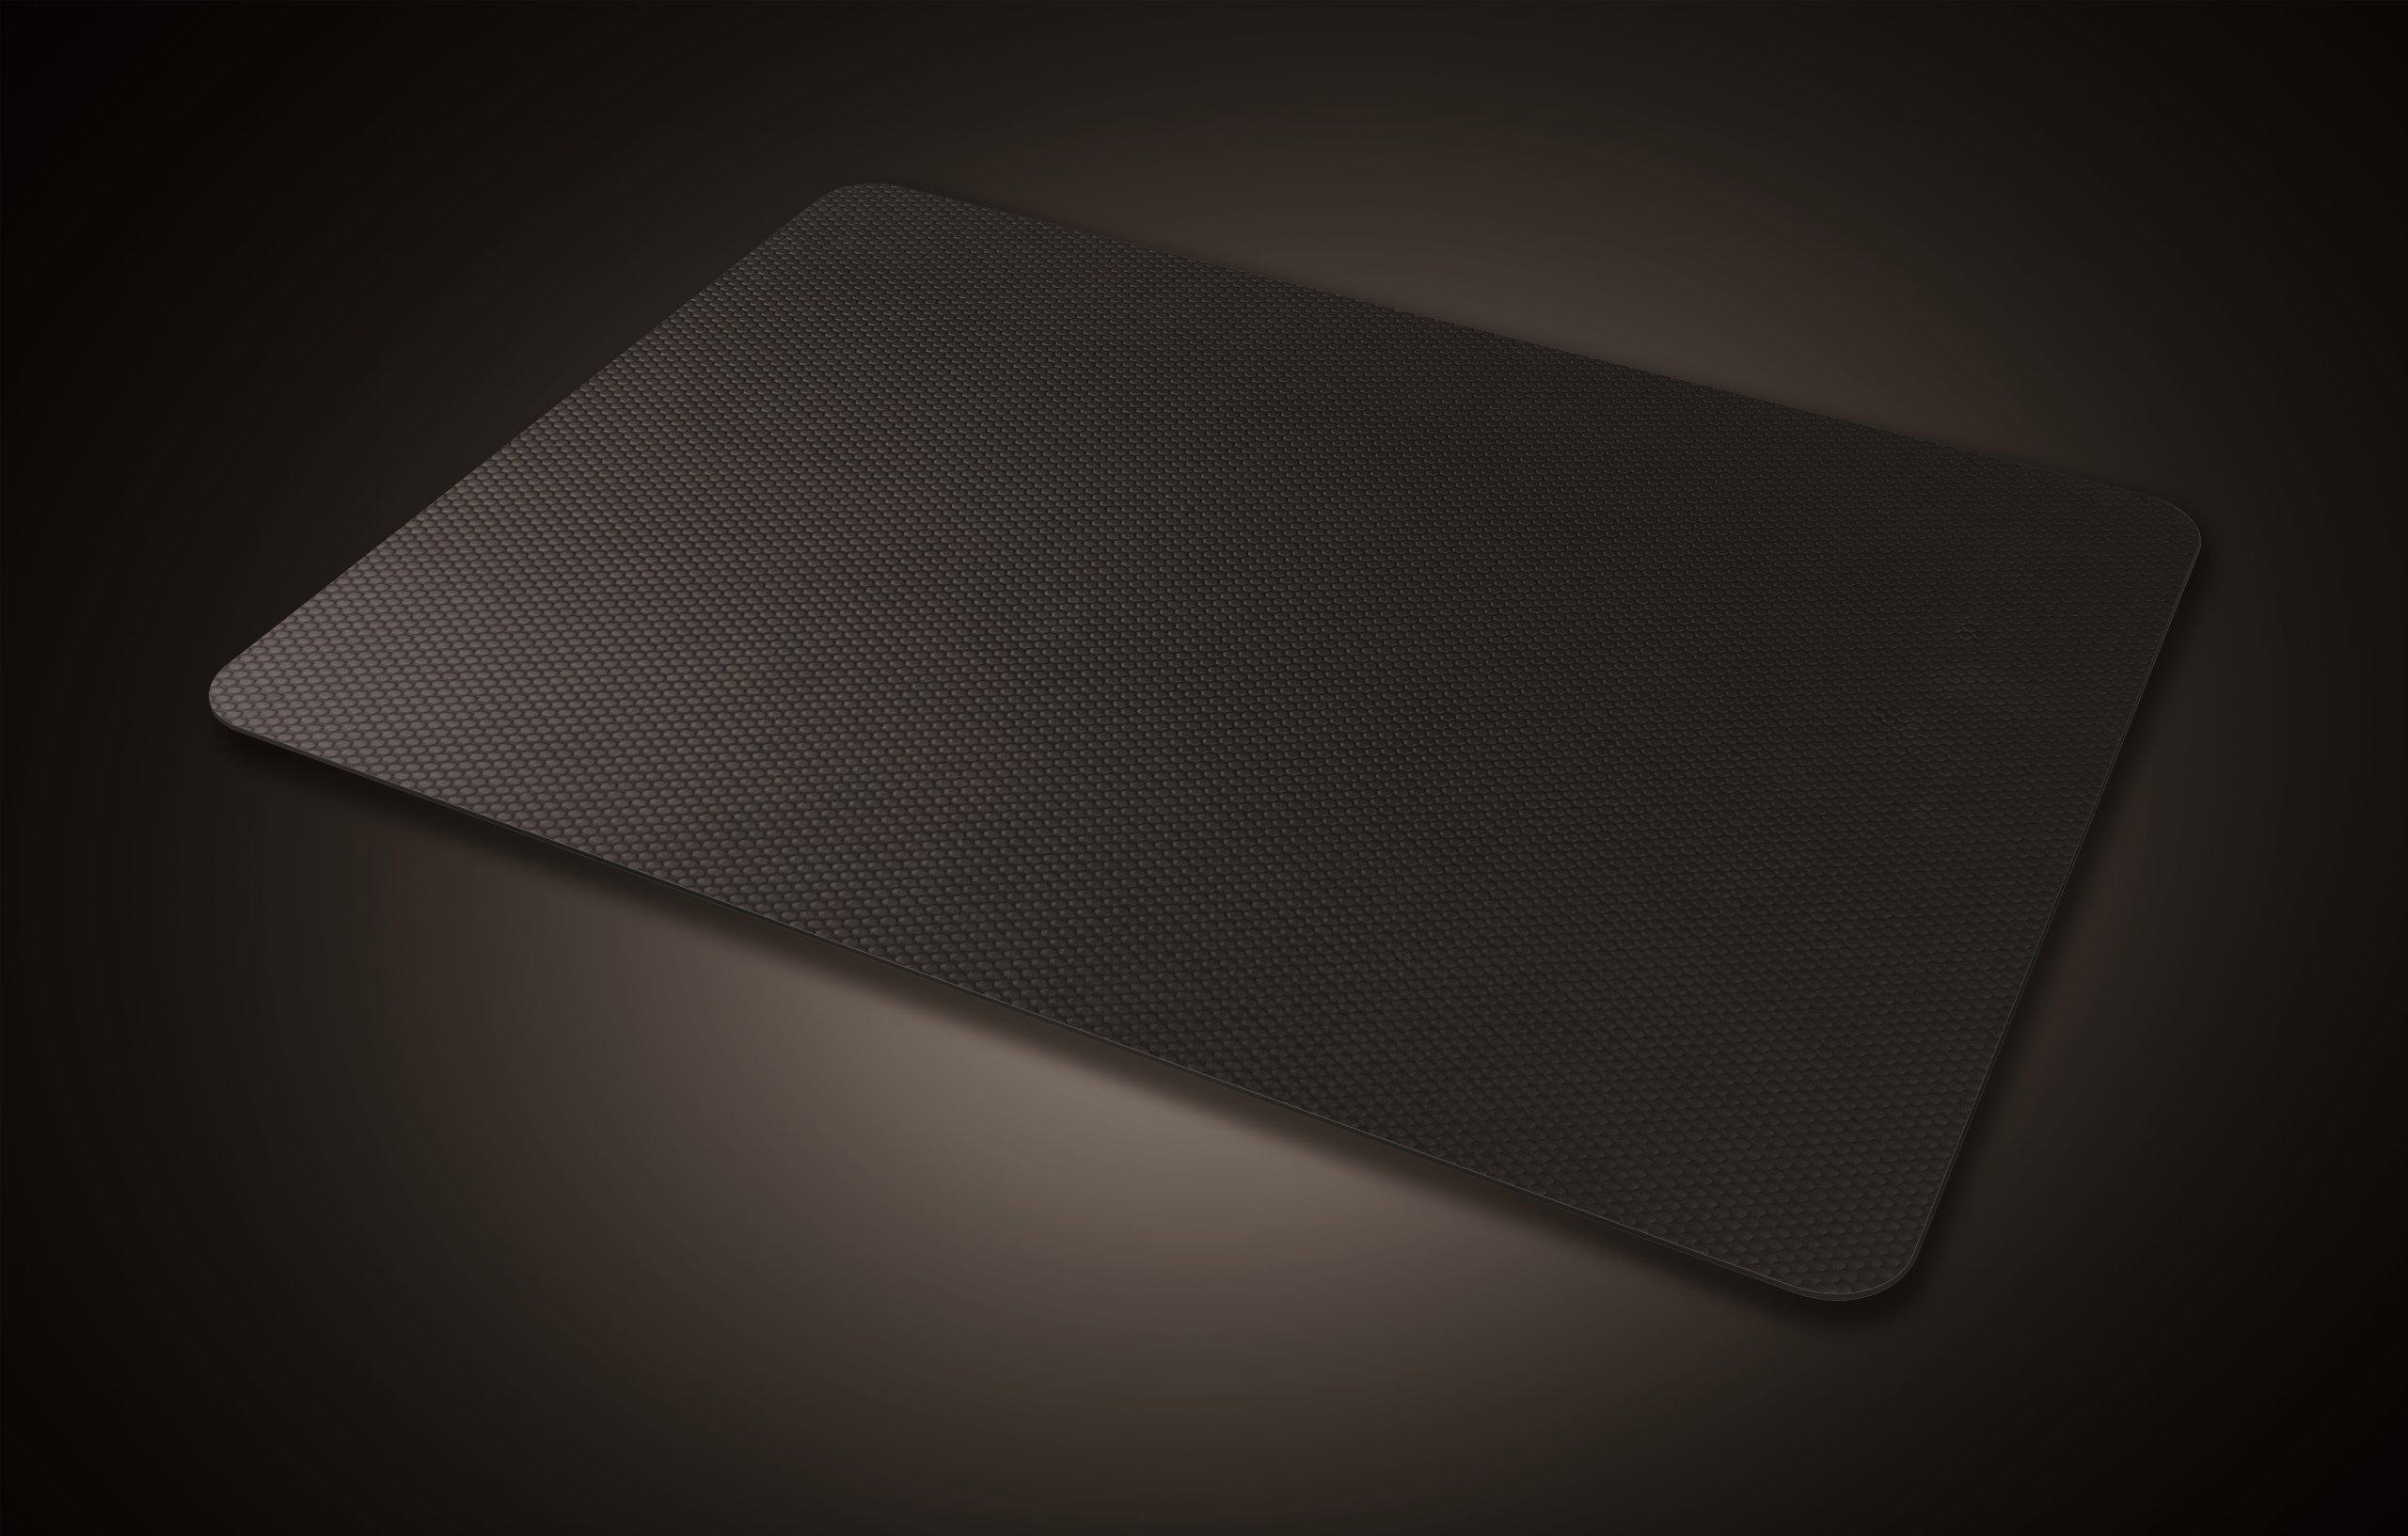 Razer Manticor: Optimized Tracking Surface - Aircraft Grade Aluminum Material - Microscopic Texture - Gaming Mouse Mat